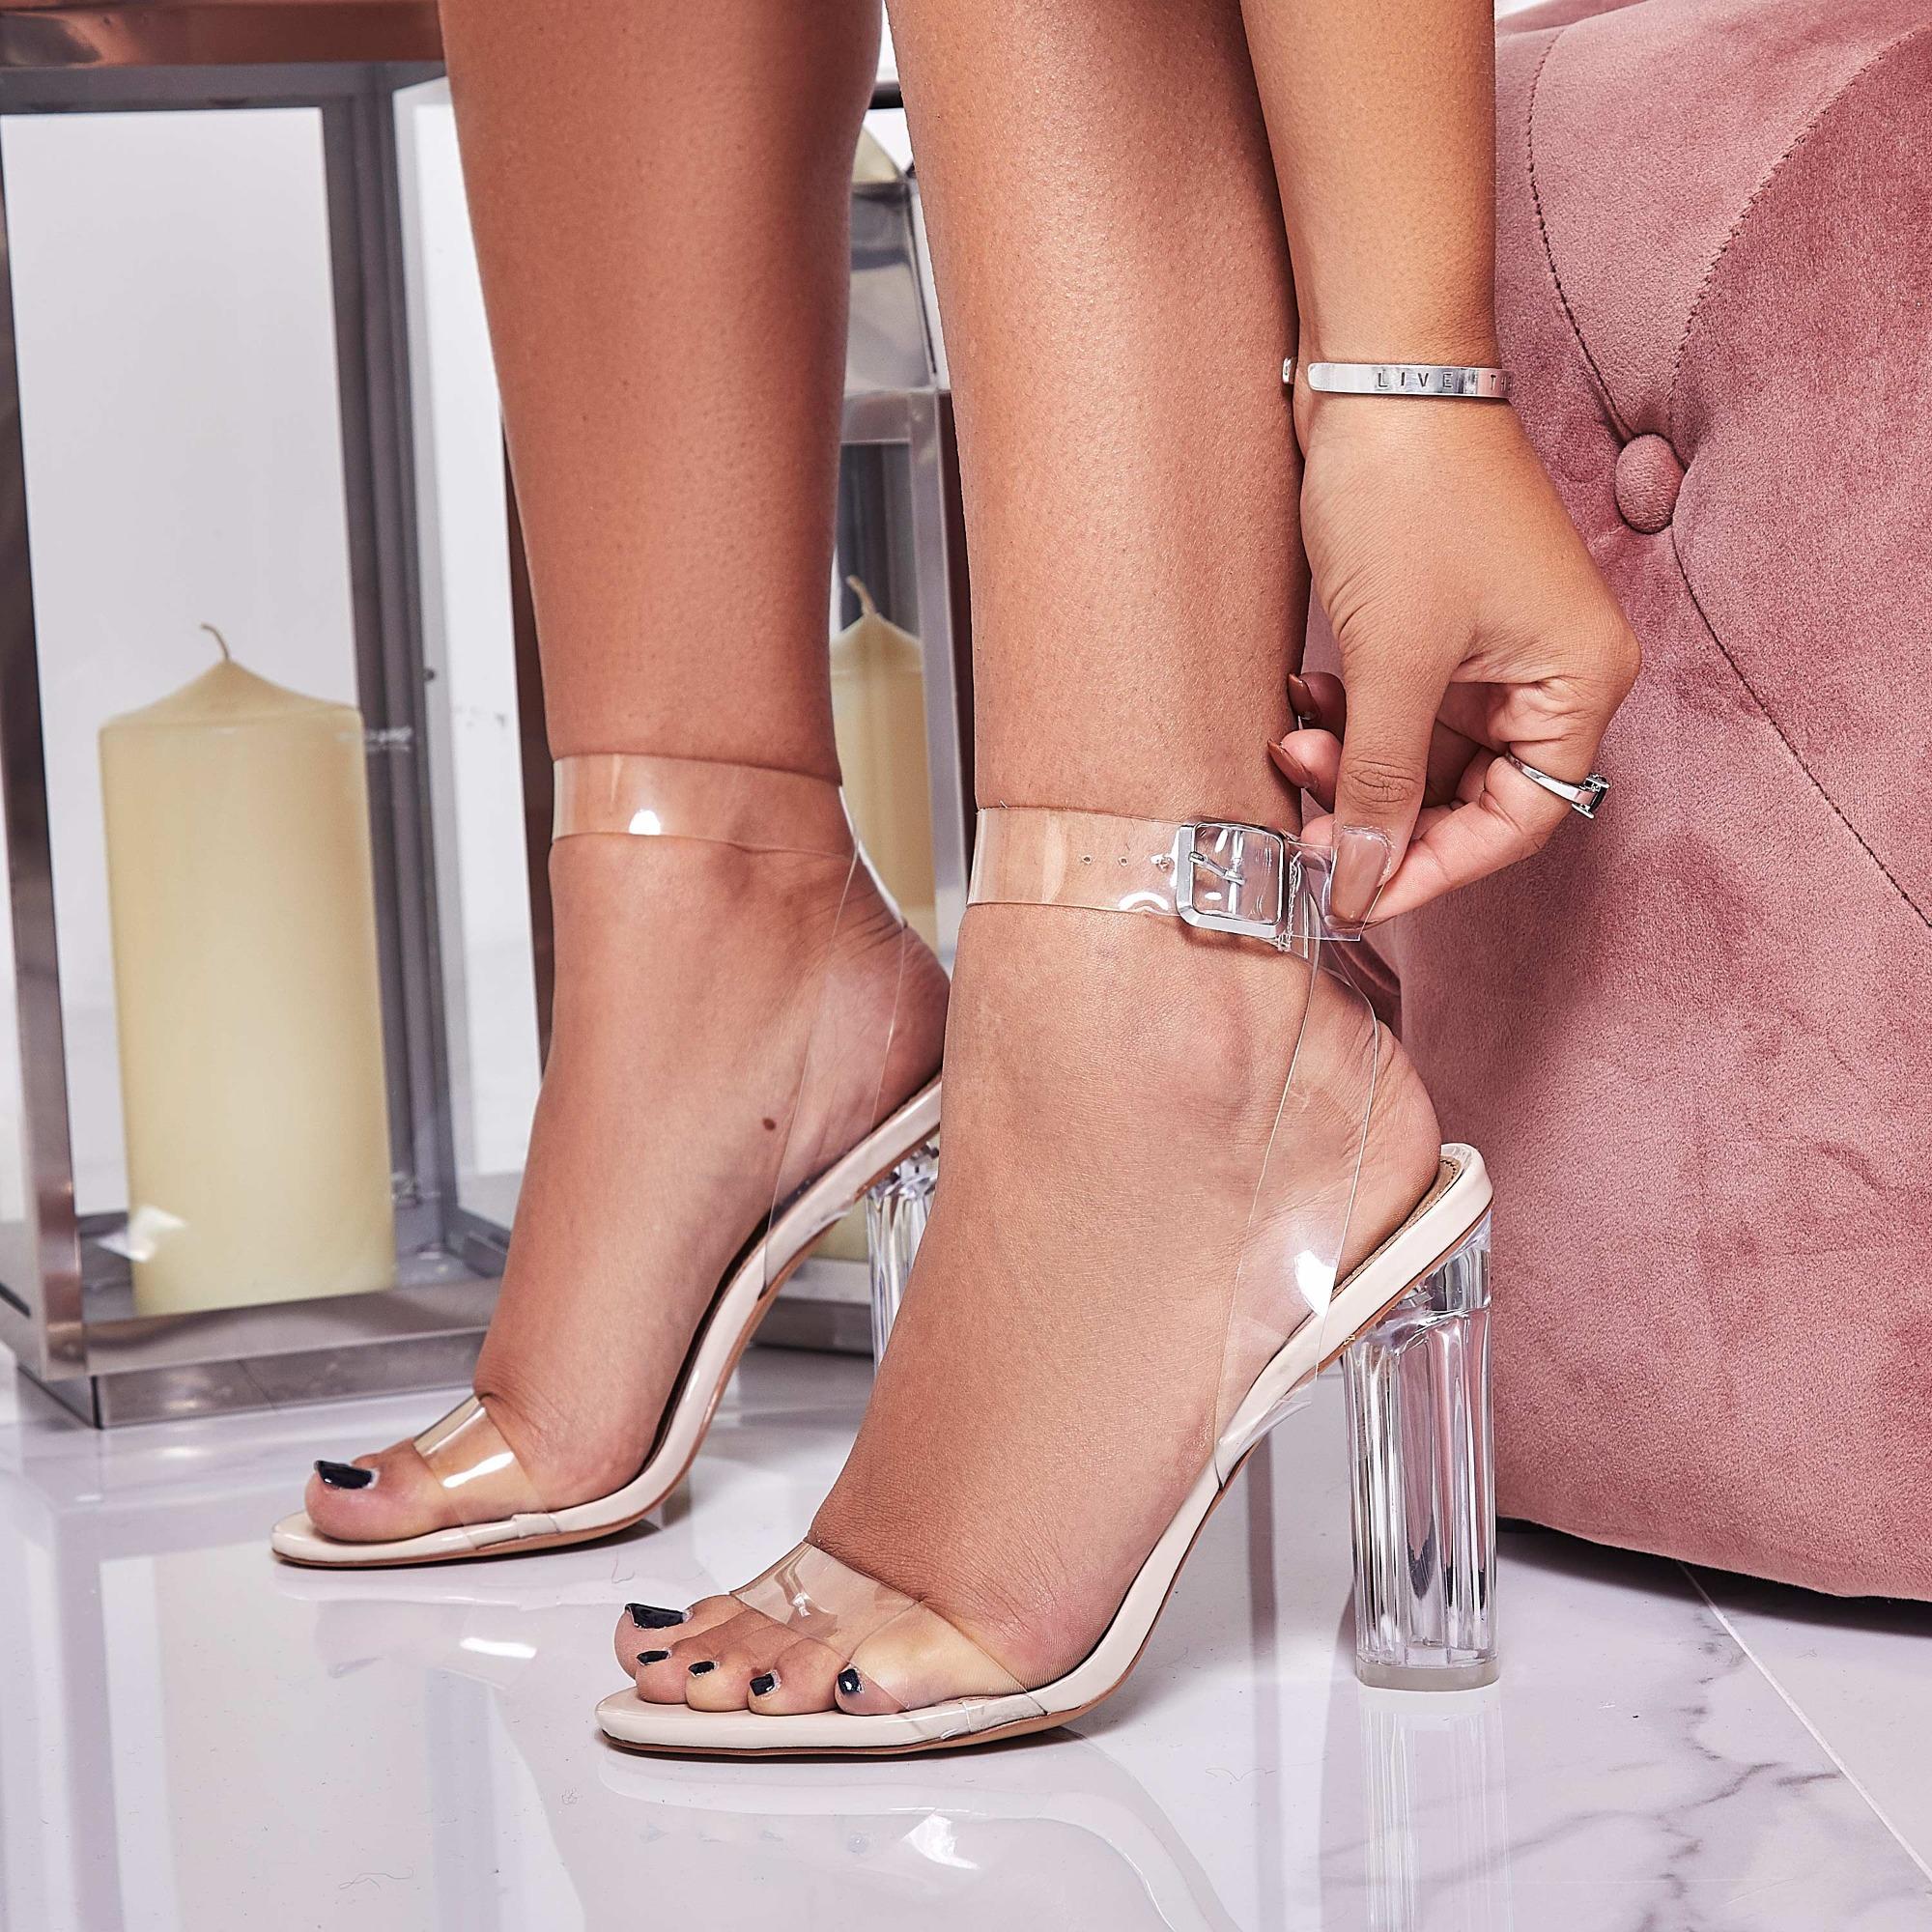 322acbae90da Ariana Strappy Sandal In Clear Perspex Image 1